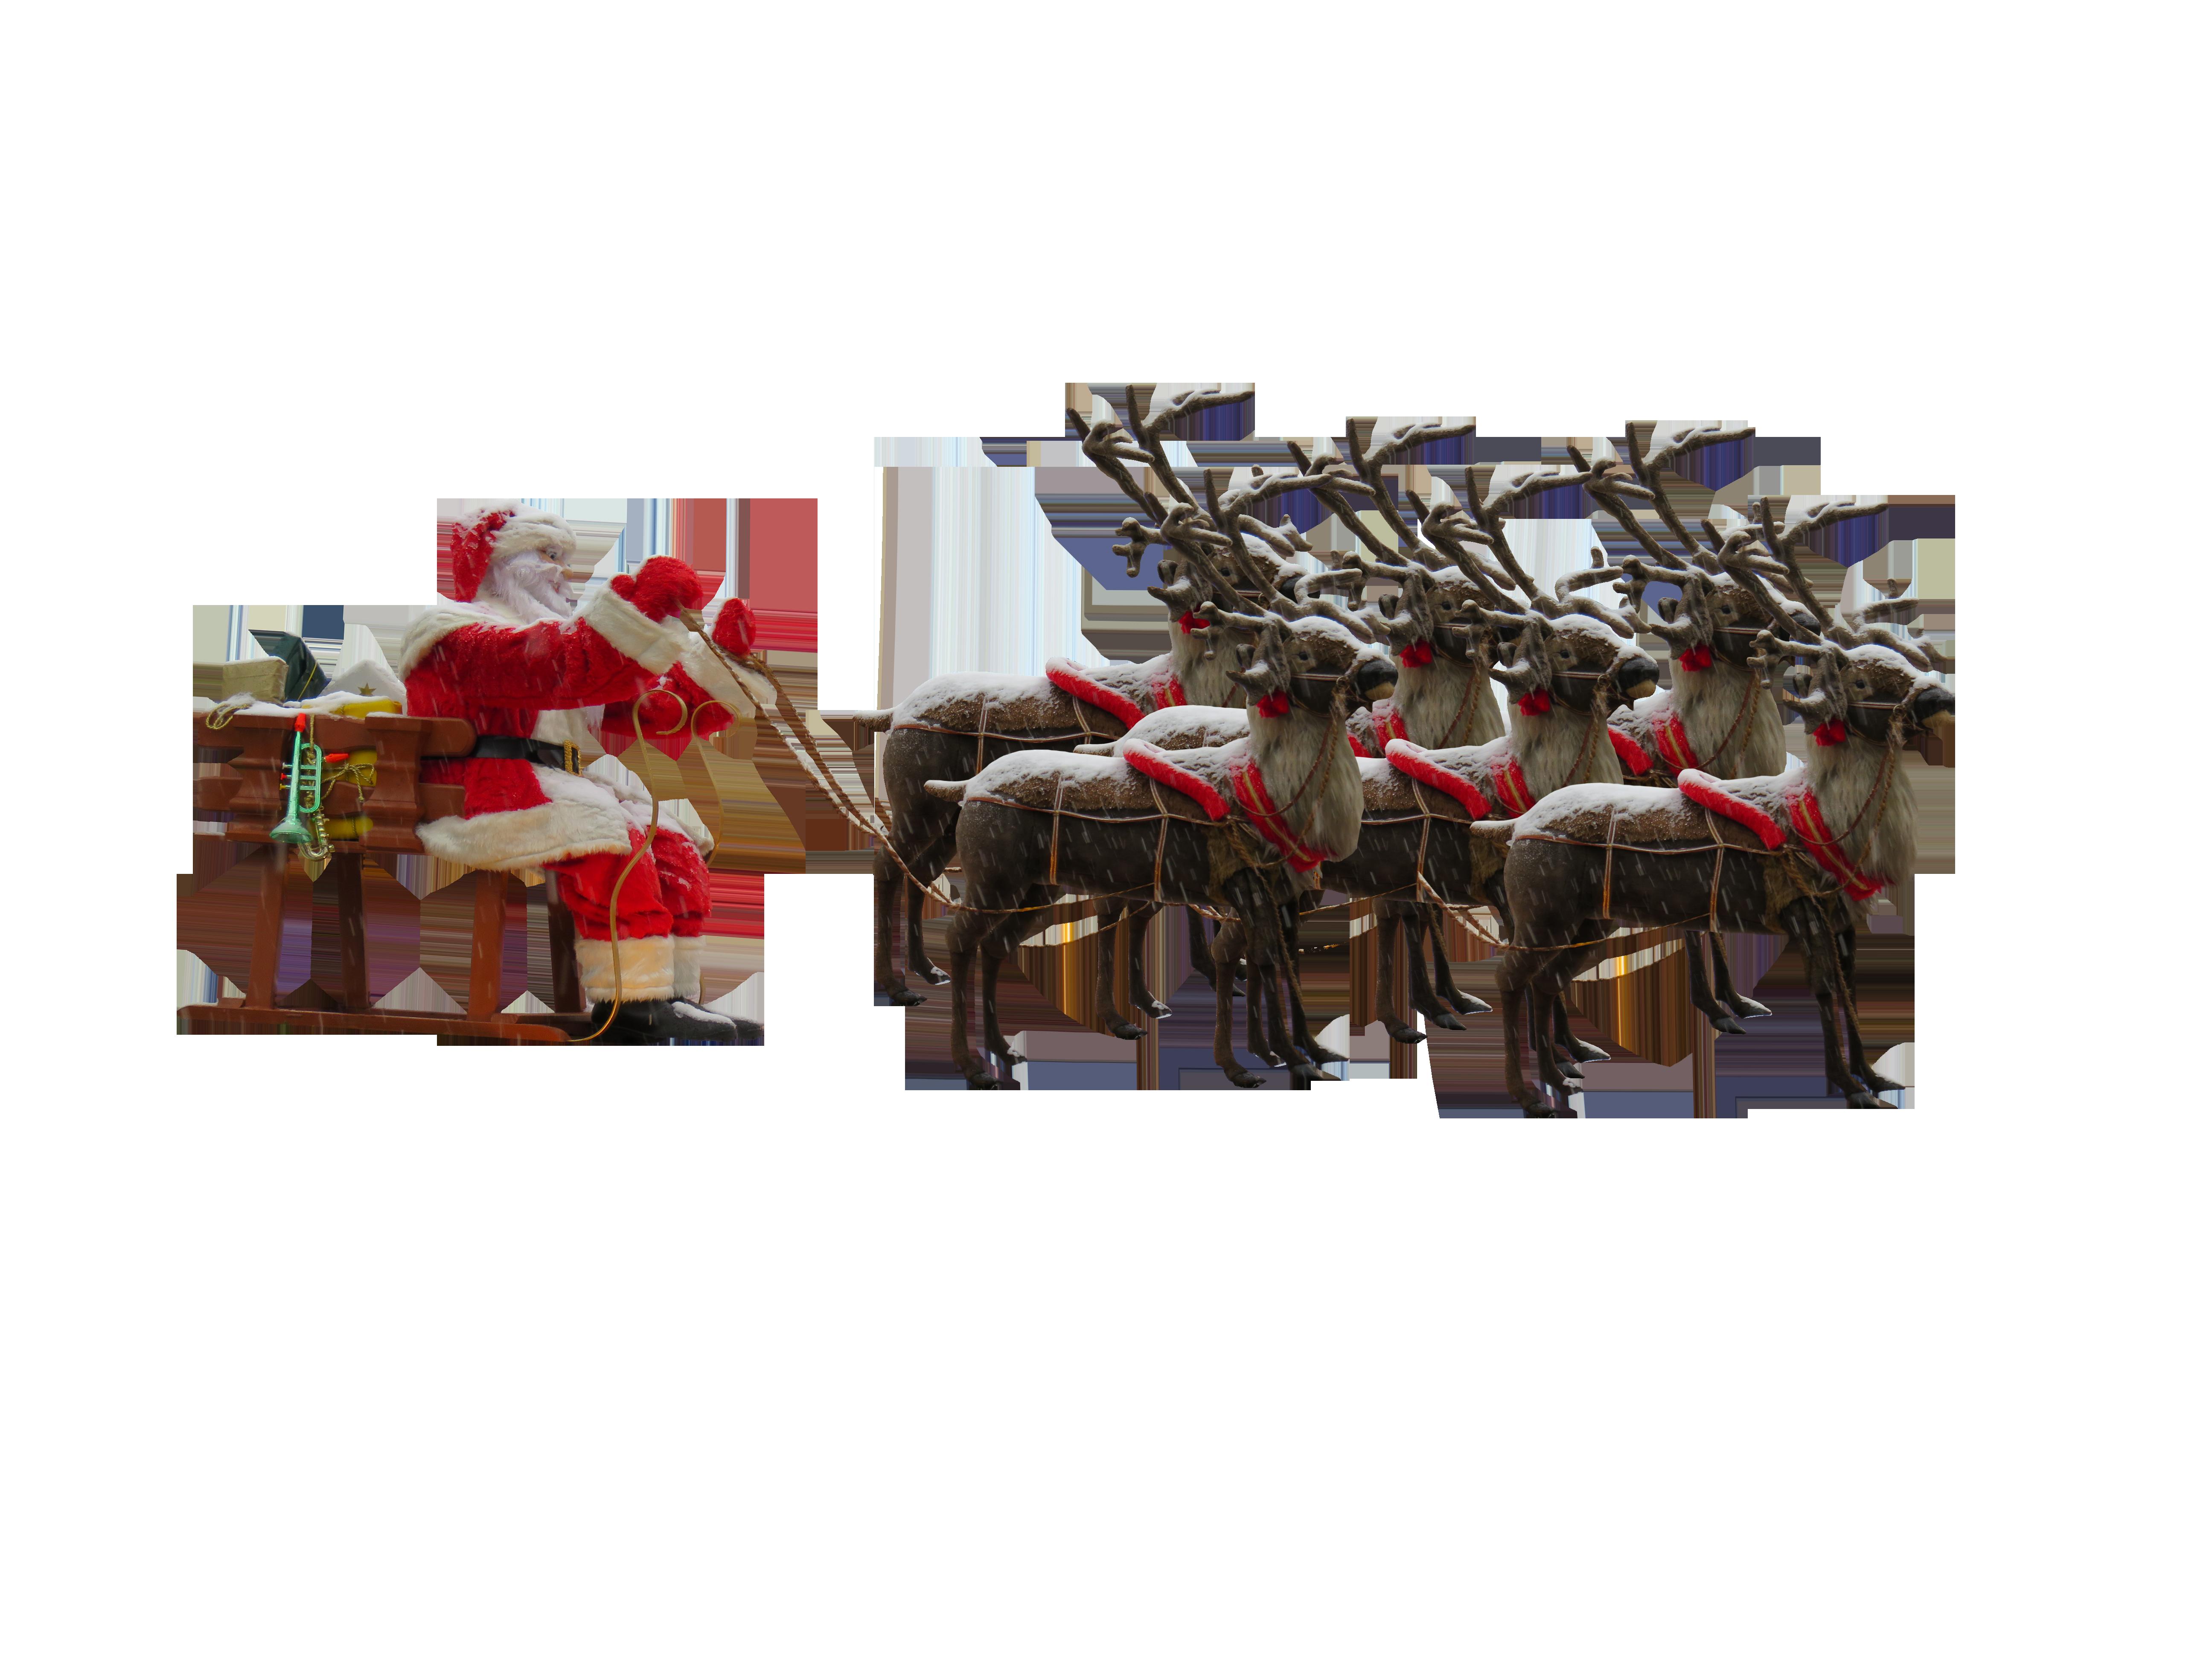 Santa Claus in Sleigh with Reindeers PNG Image